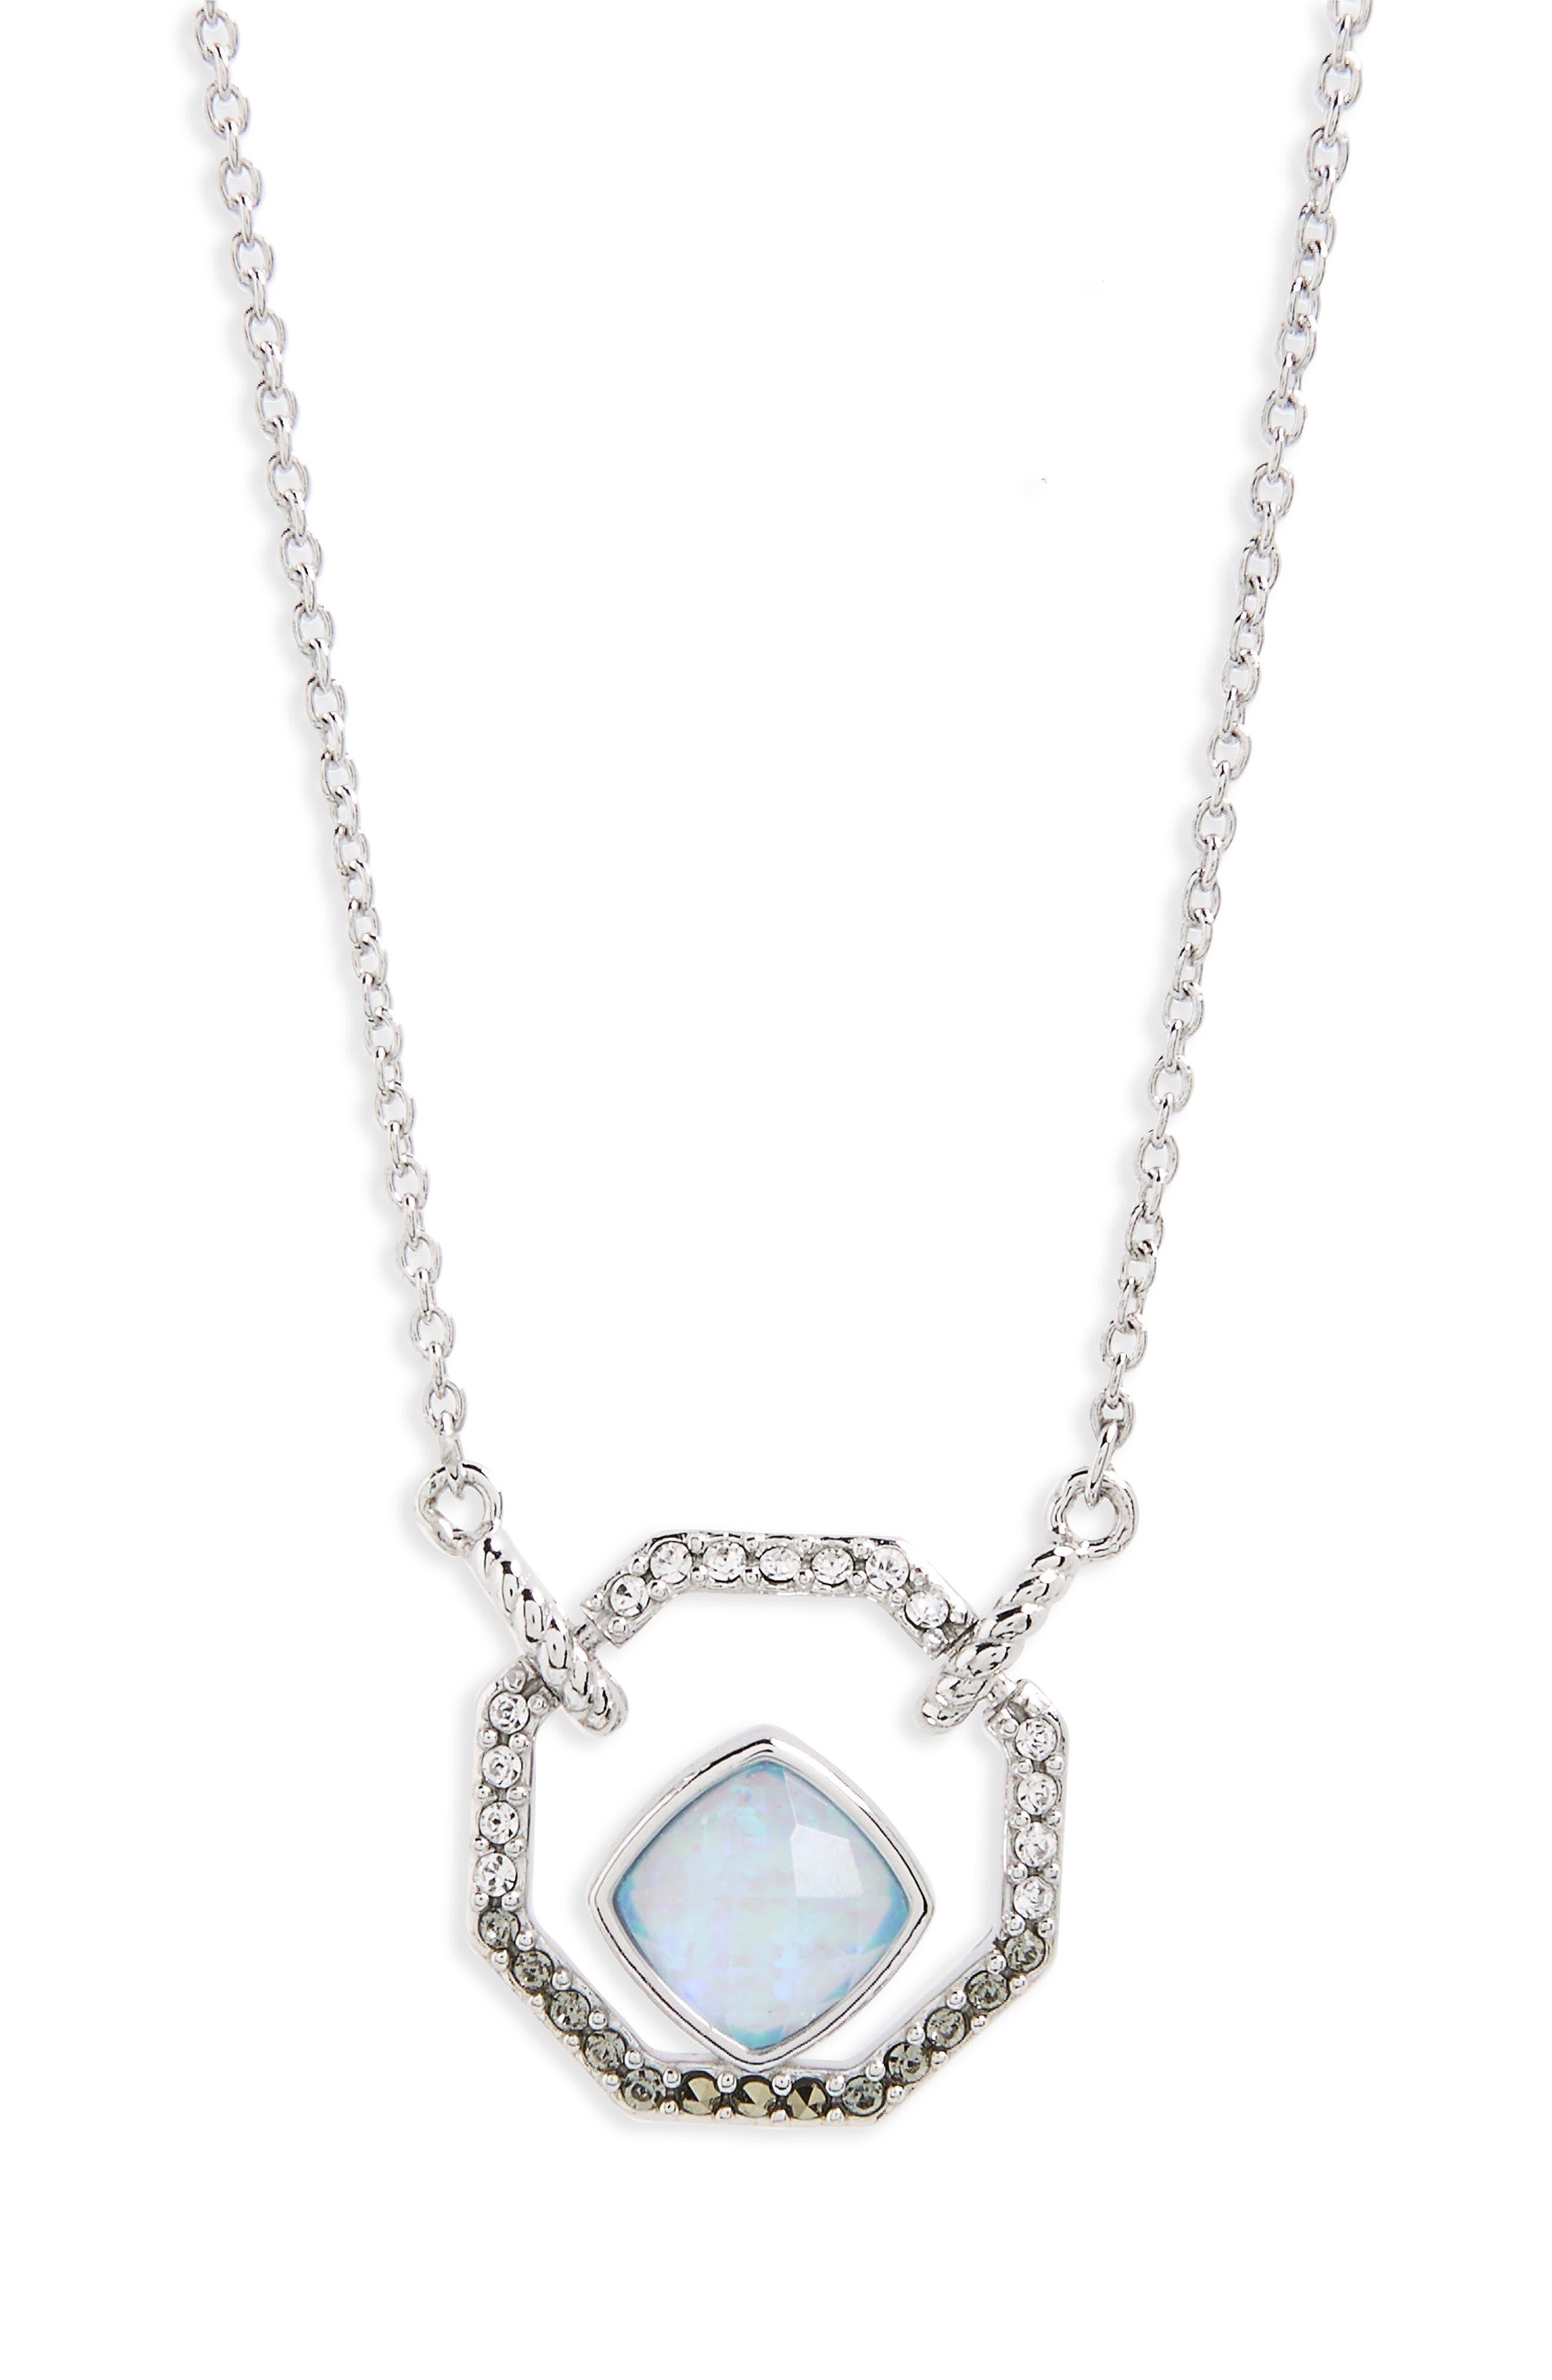 JUDITH JACK Paradise Pendant Necklace